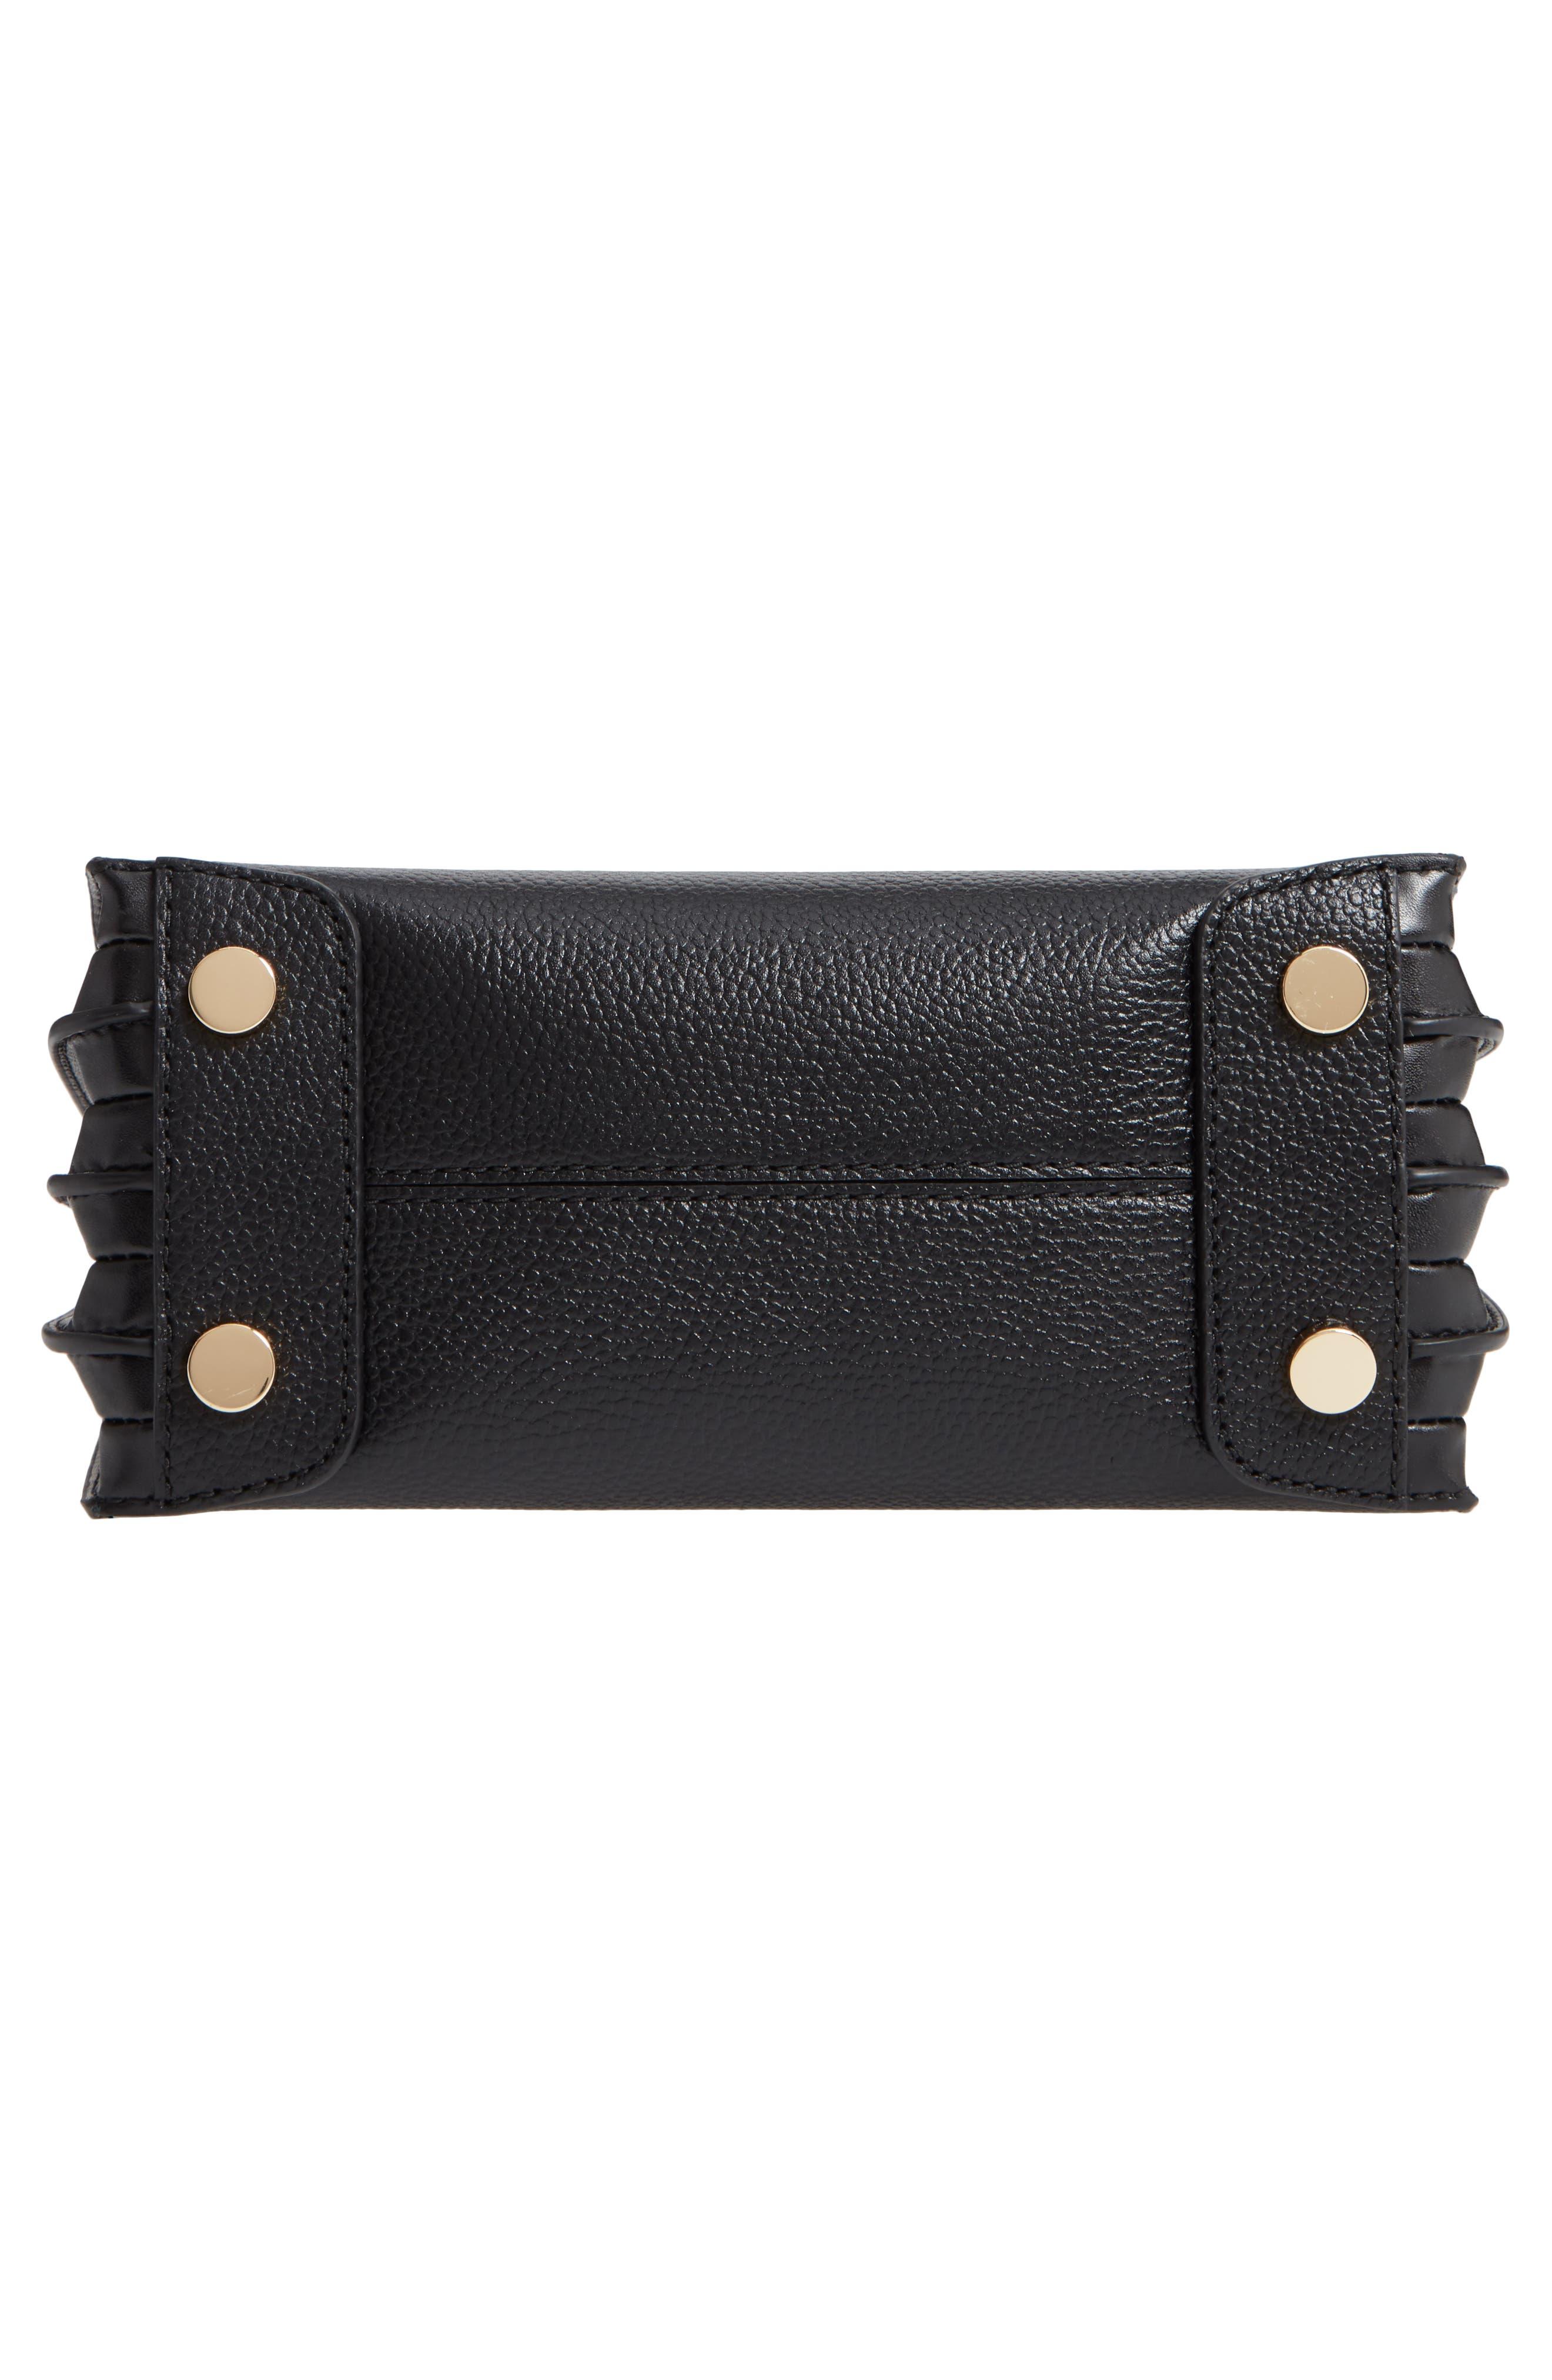 MICHAEL MICHAEL KORS, Medium Mercer Convertible Leather Tote, Alternate thumbnail 7, color, BLACK